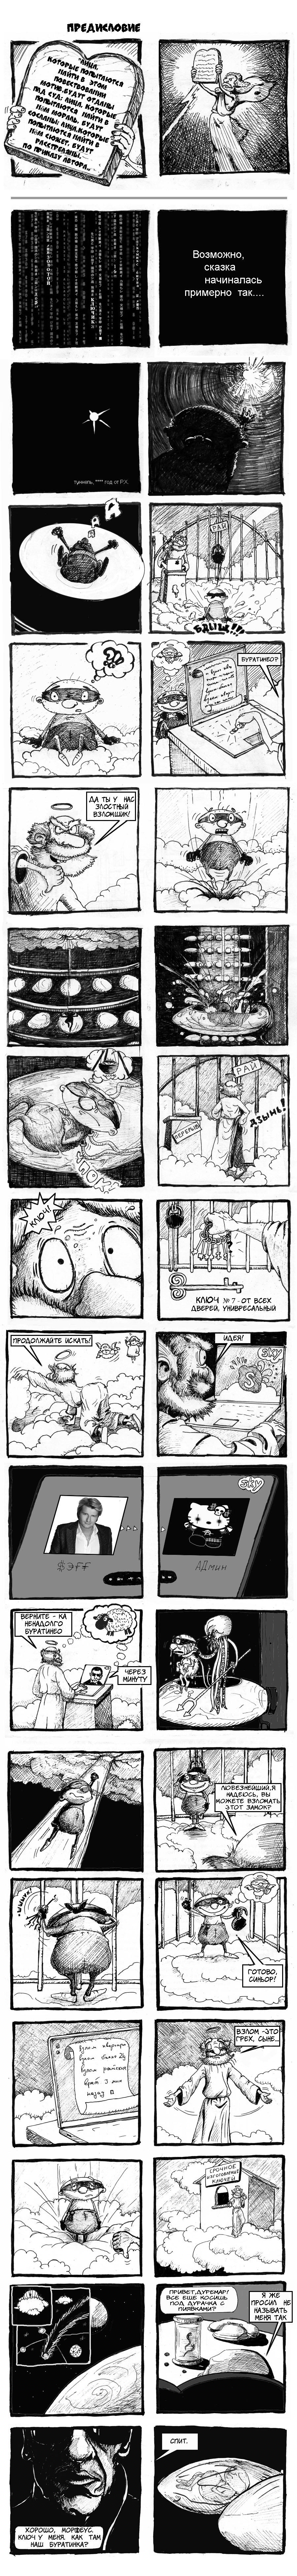 Комикс битва №16 выпуск 180